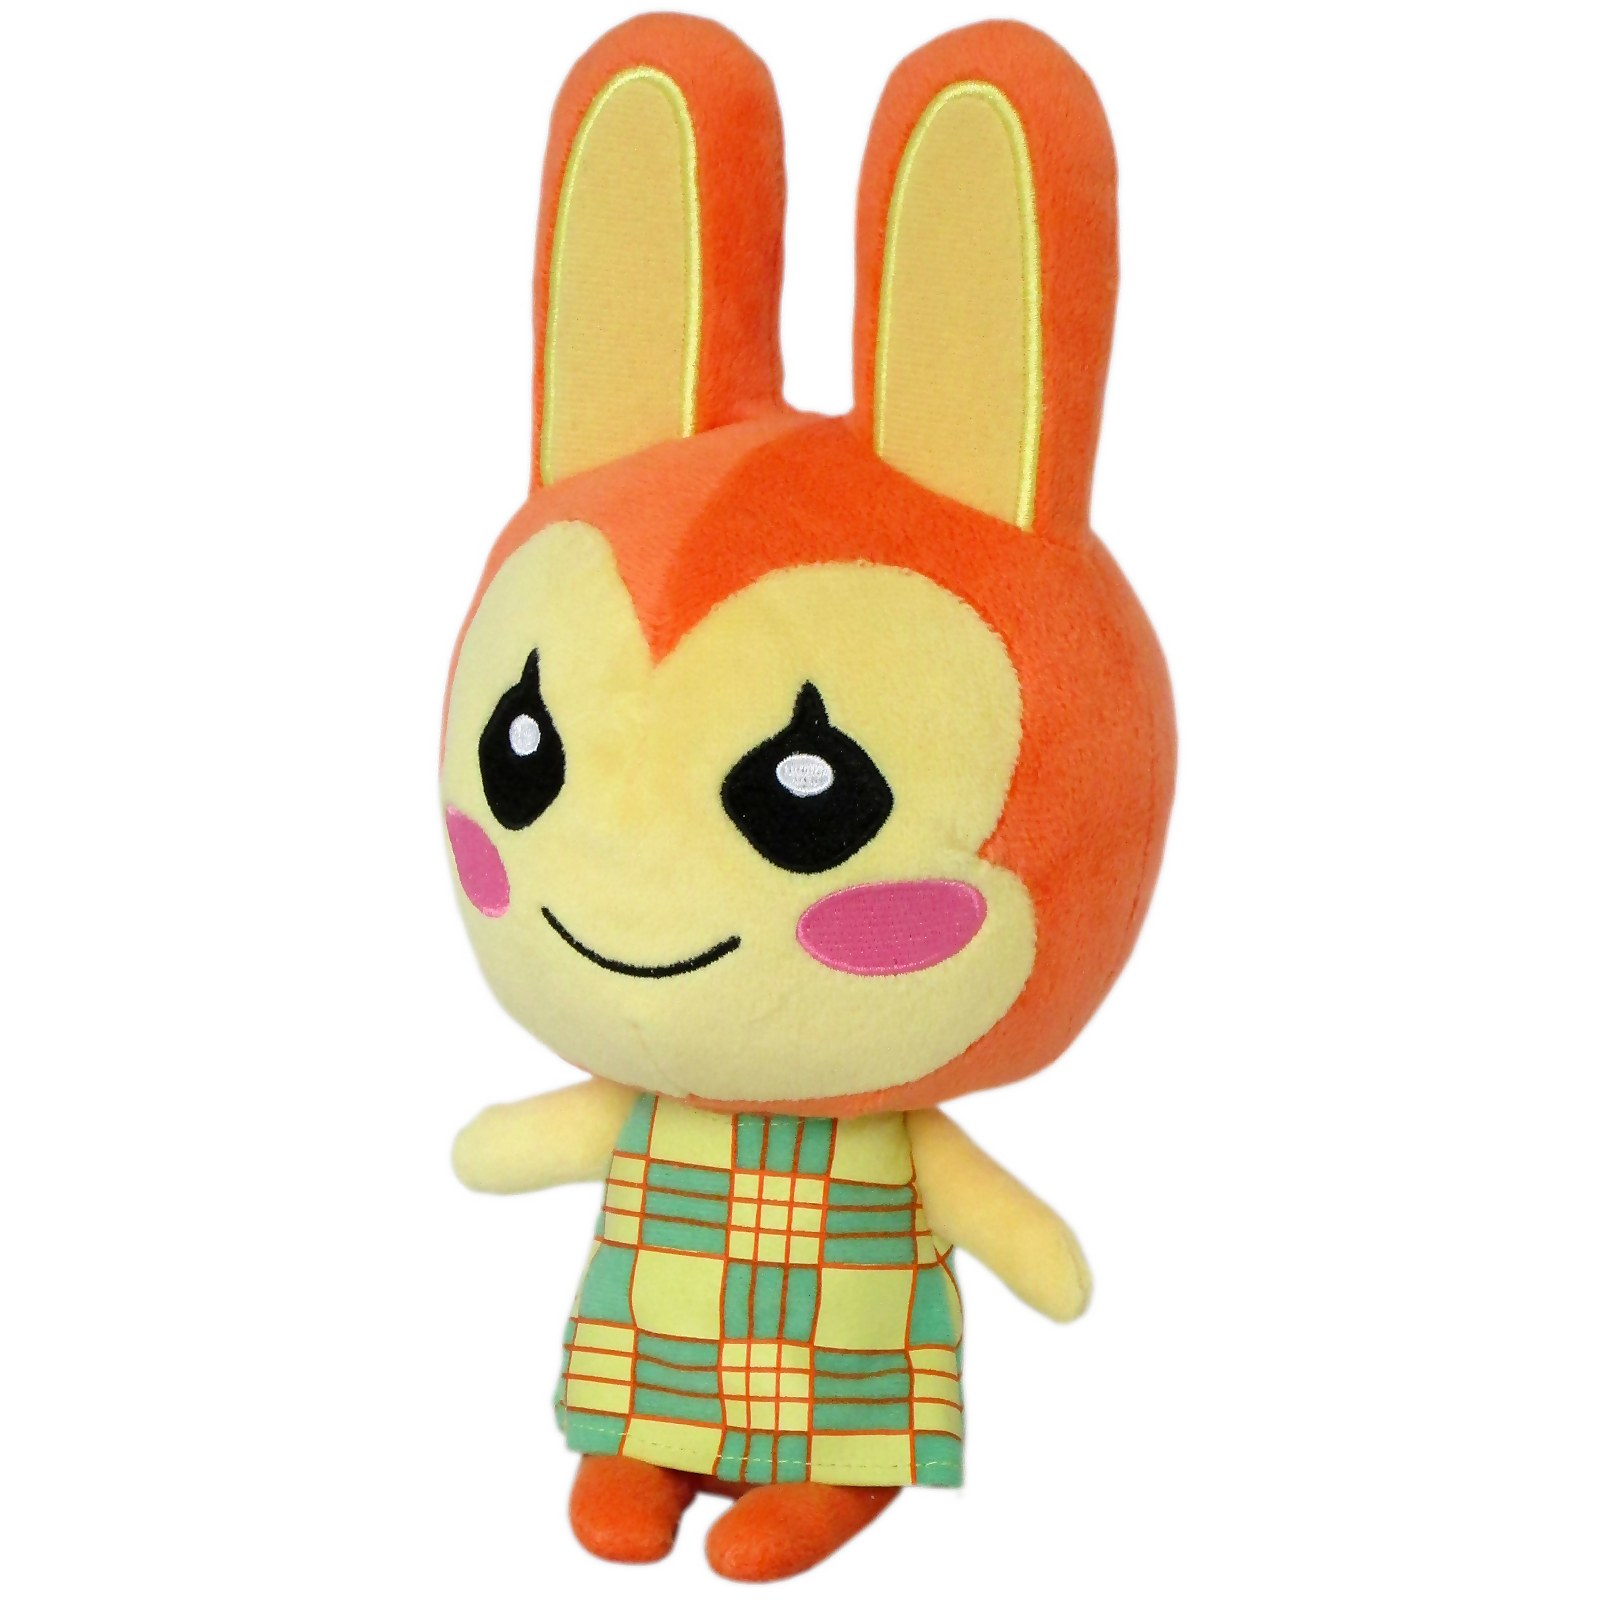 Image of Animal Crossing - Bunnie (Lilian) Plush 20cm